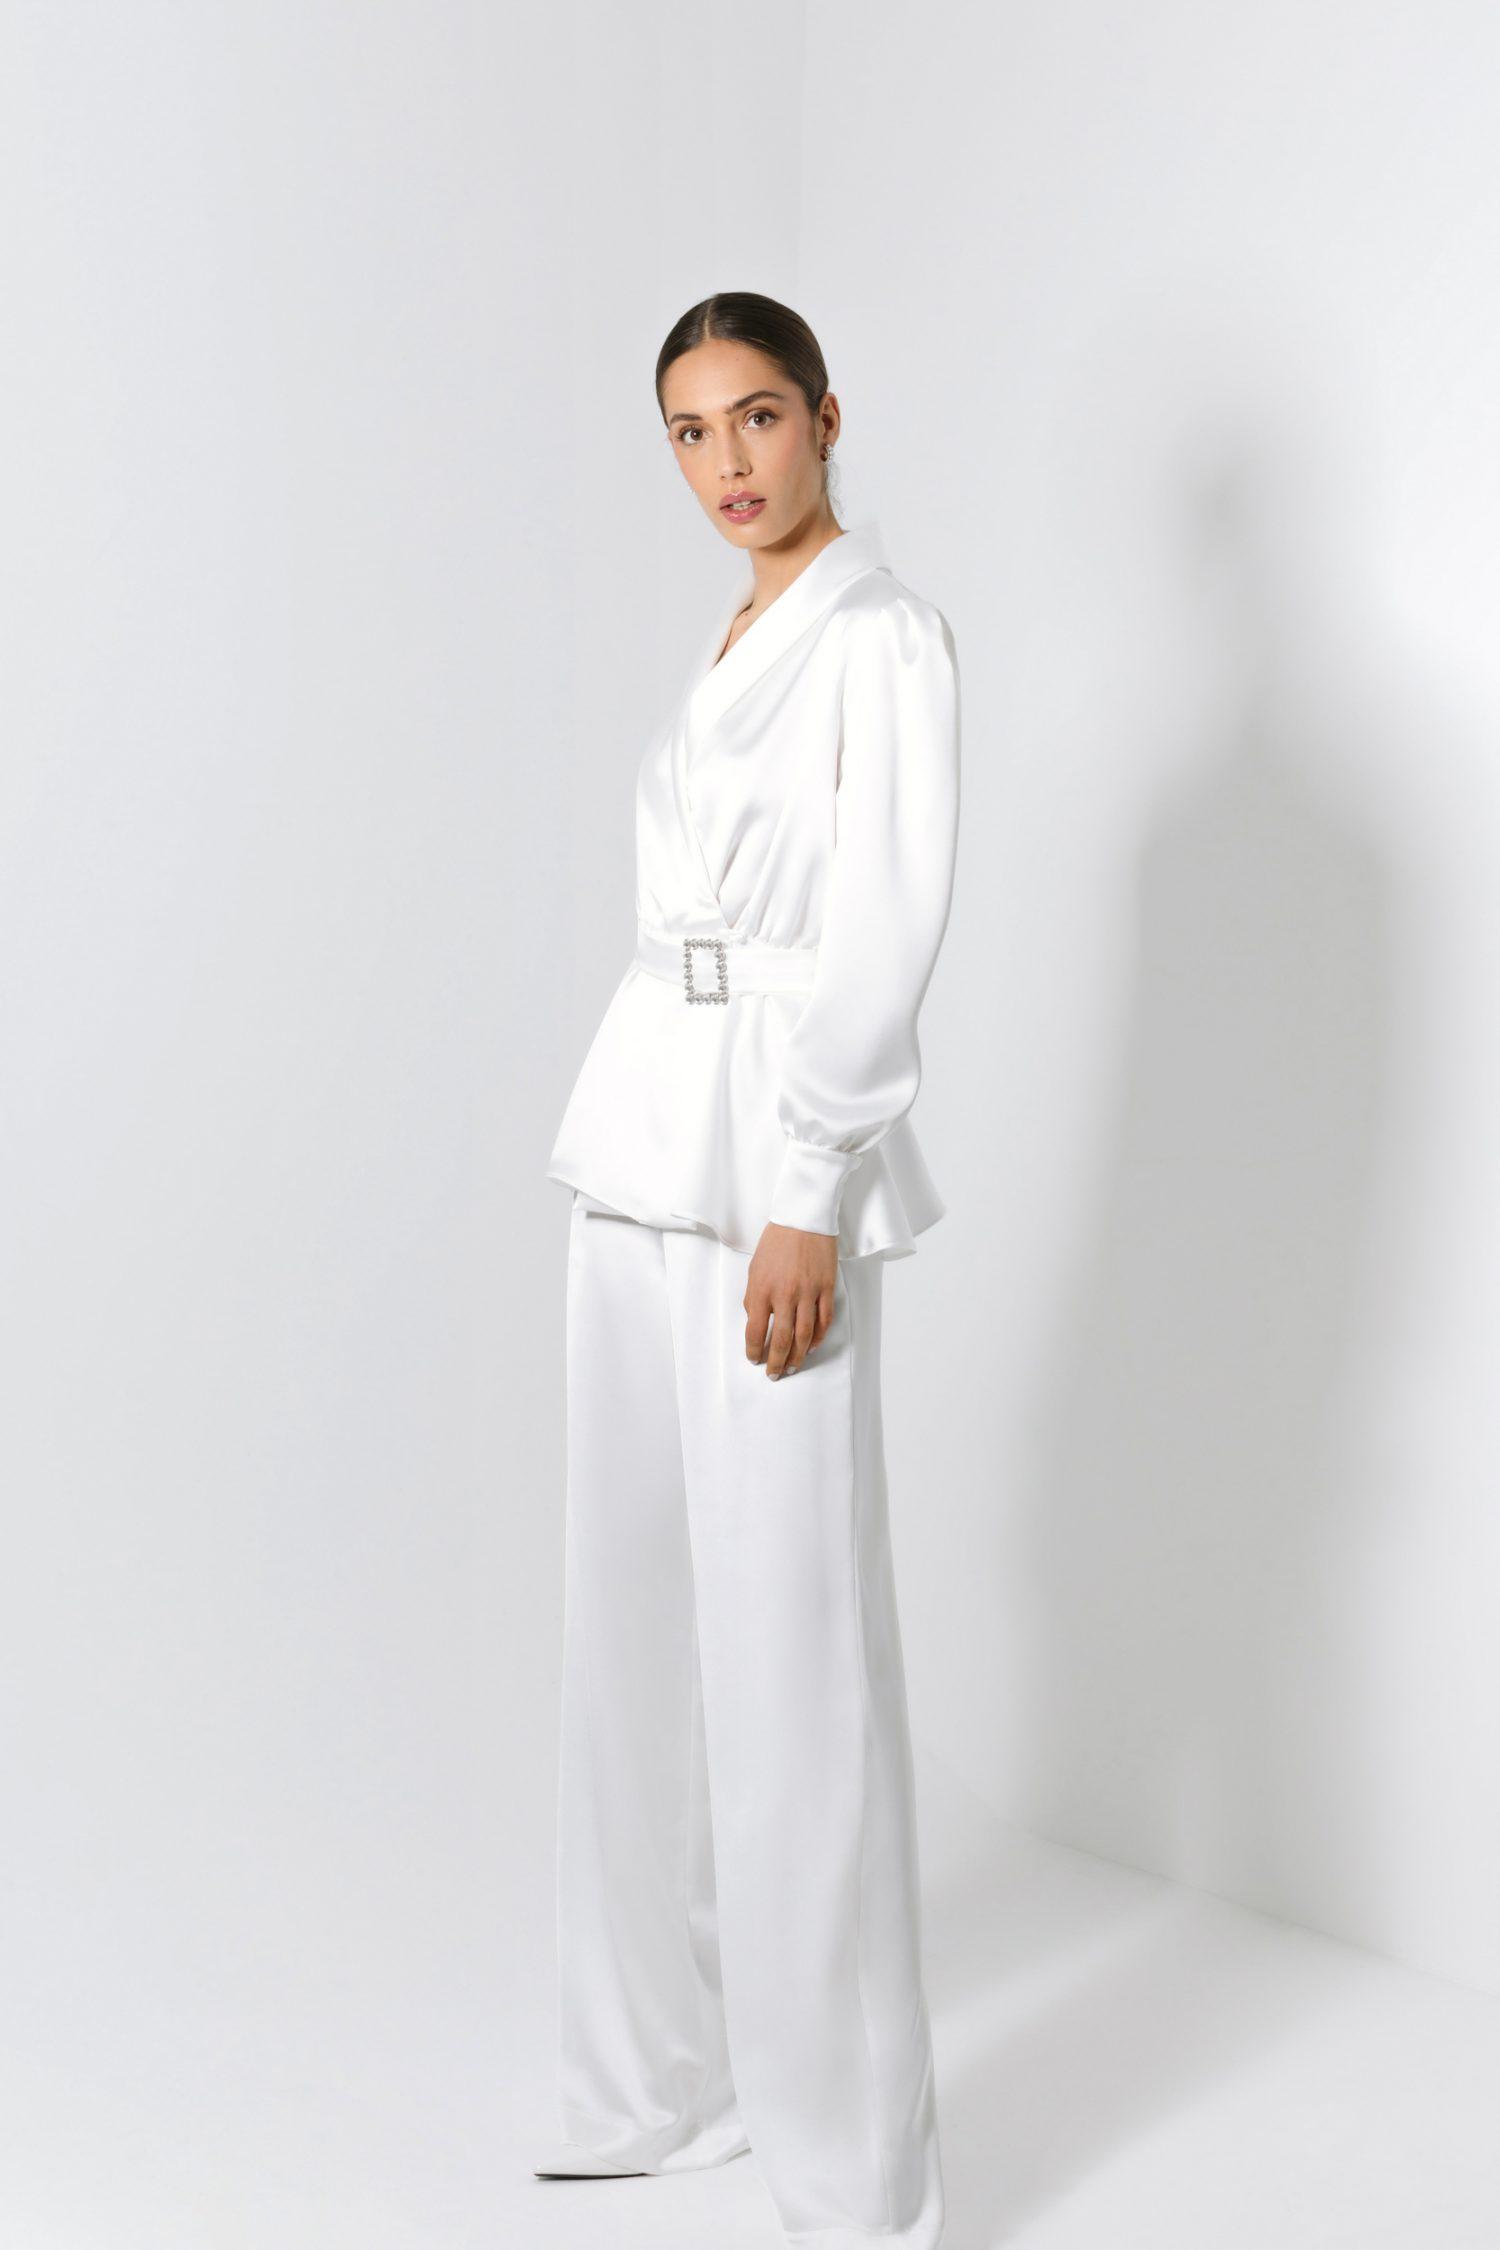 Conjunto de fato de noiva branco elegante com cinto.